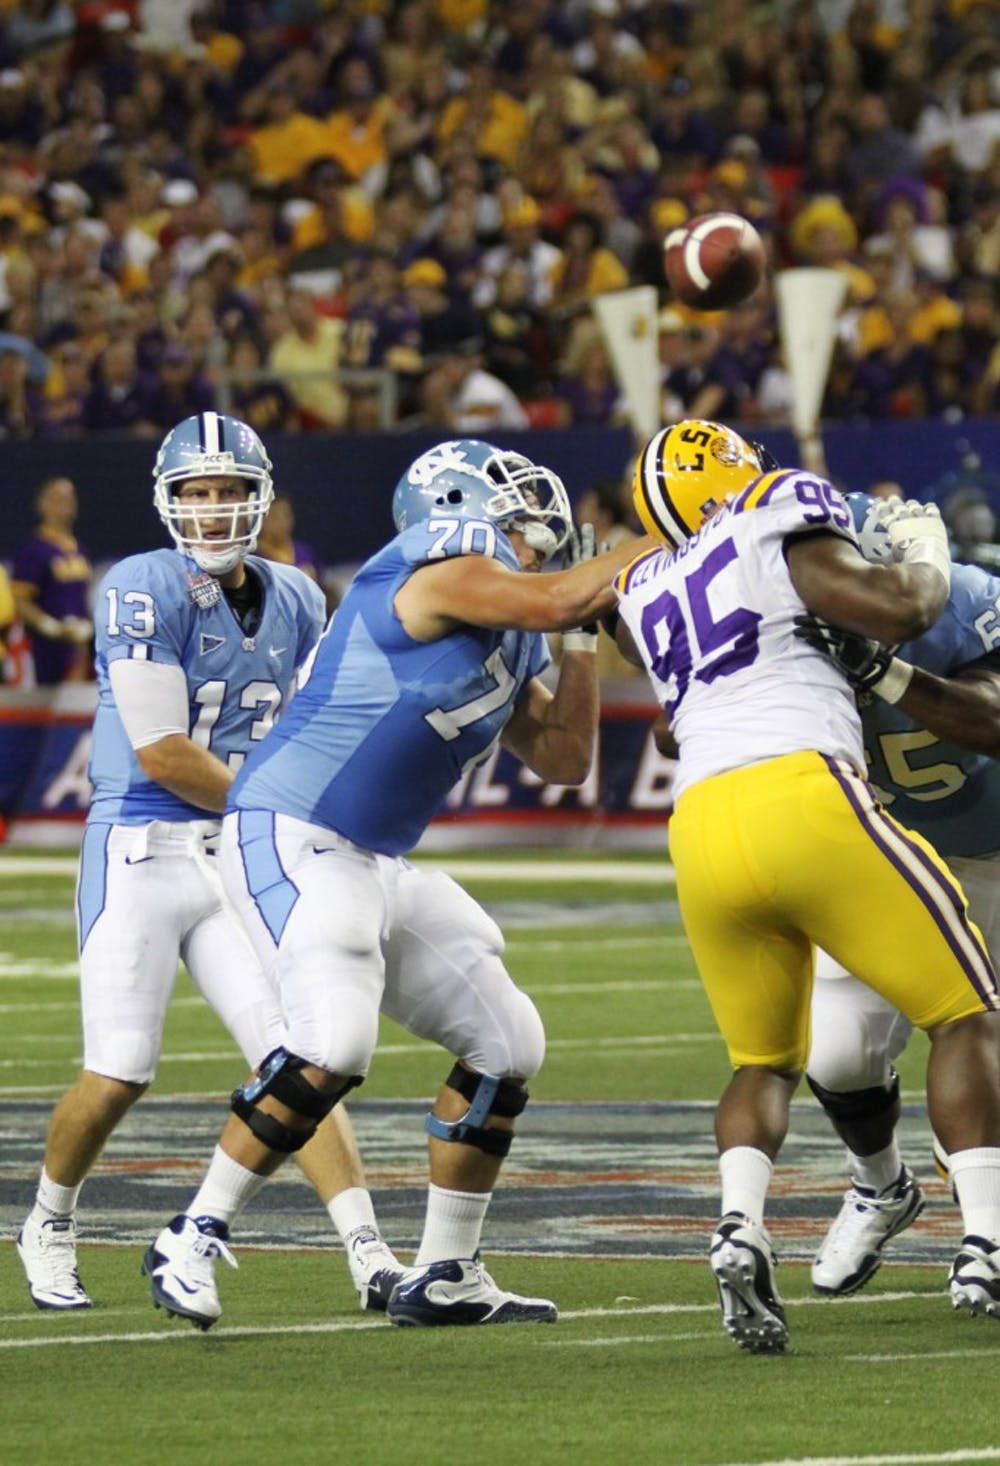 Heroic comeback falls short vs. LSU